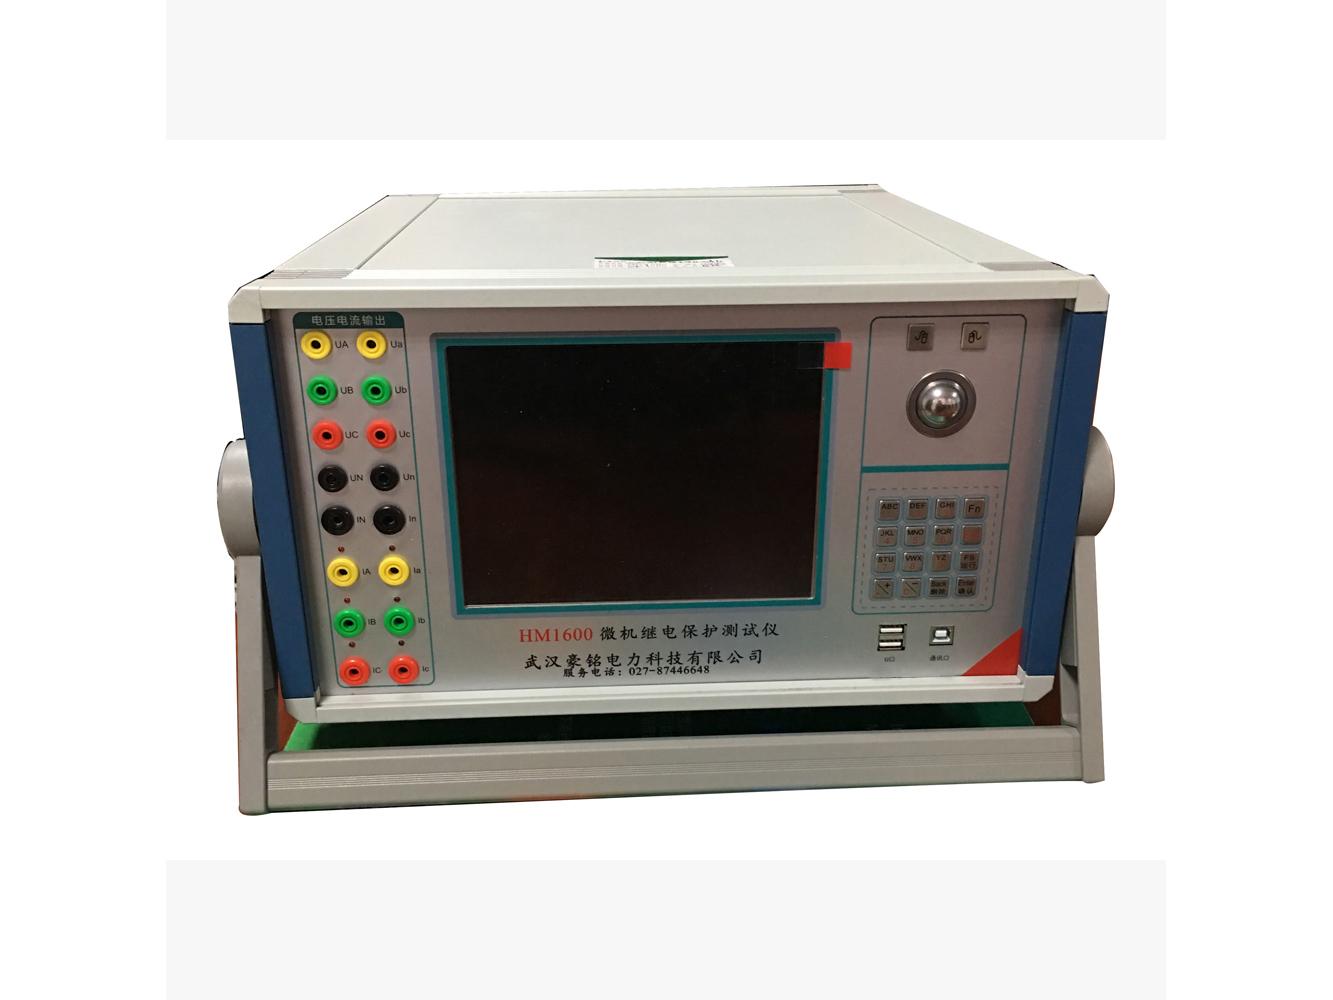 HM1600微機繼電保護測試儀